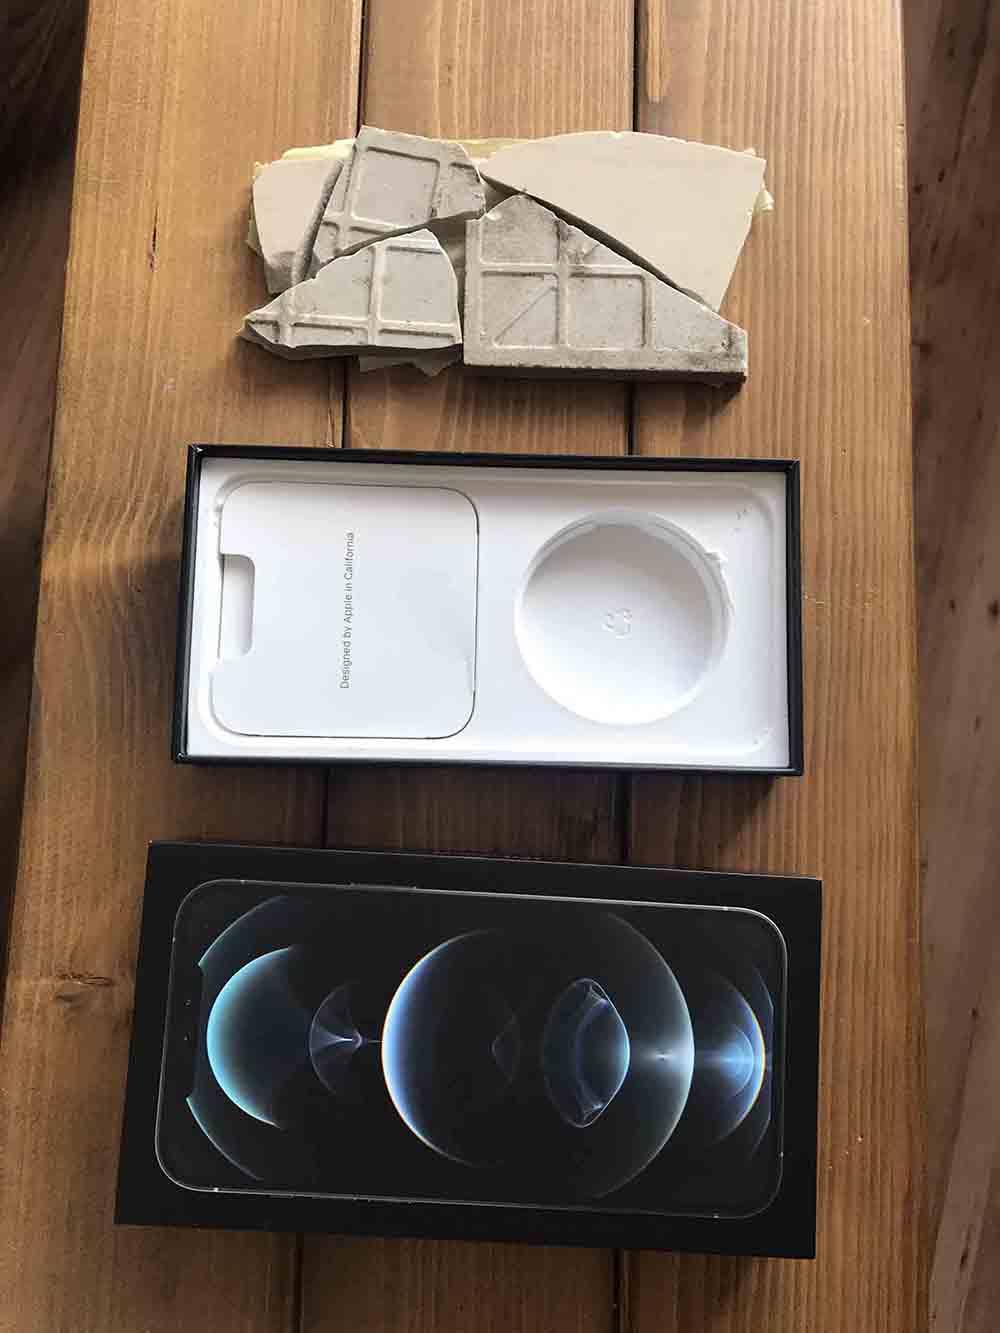 Virgin media customer receives broken tile instead of iPhone - Consumer News